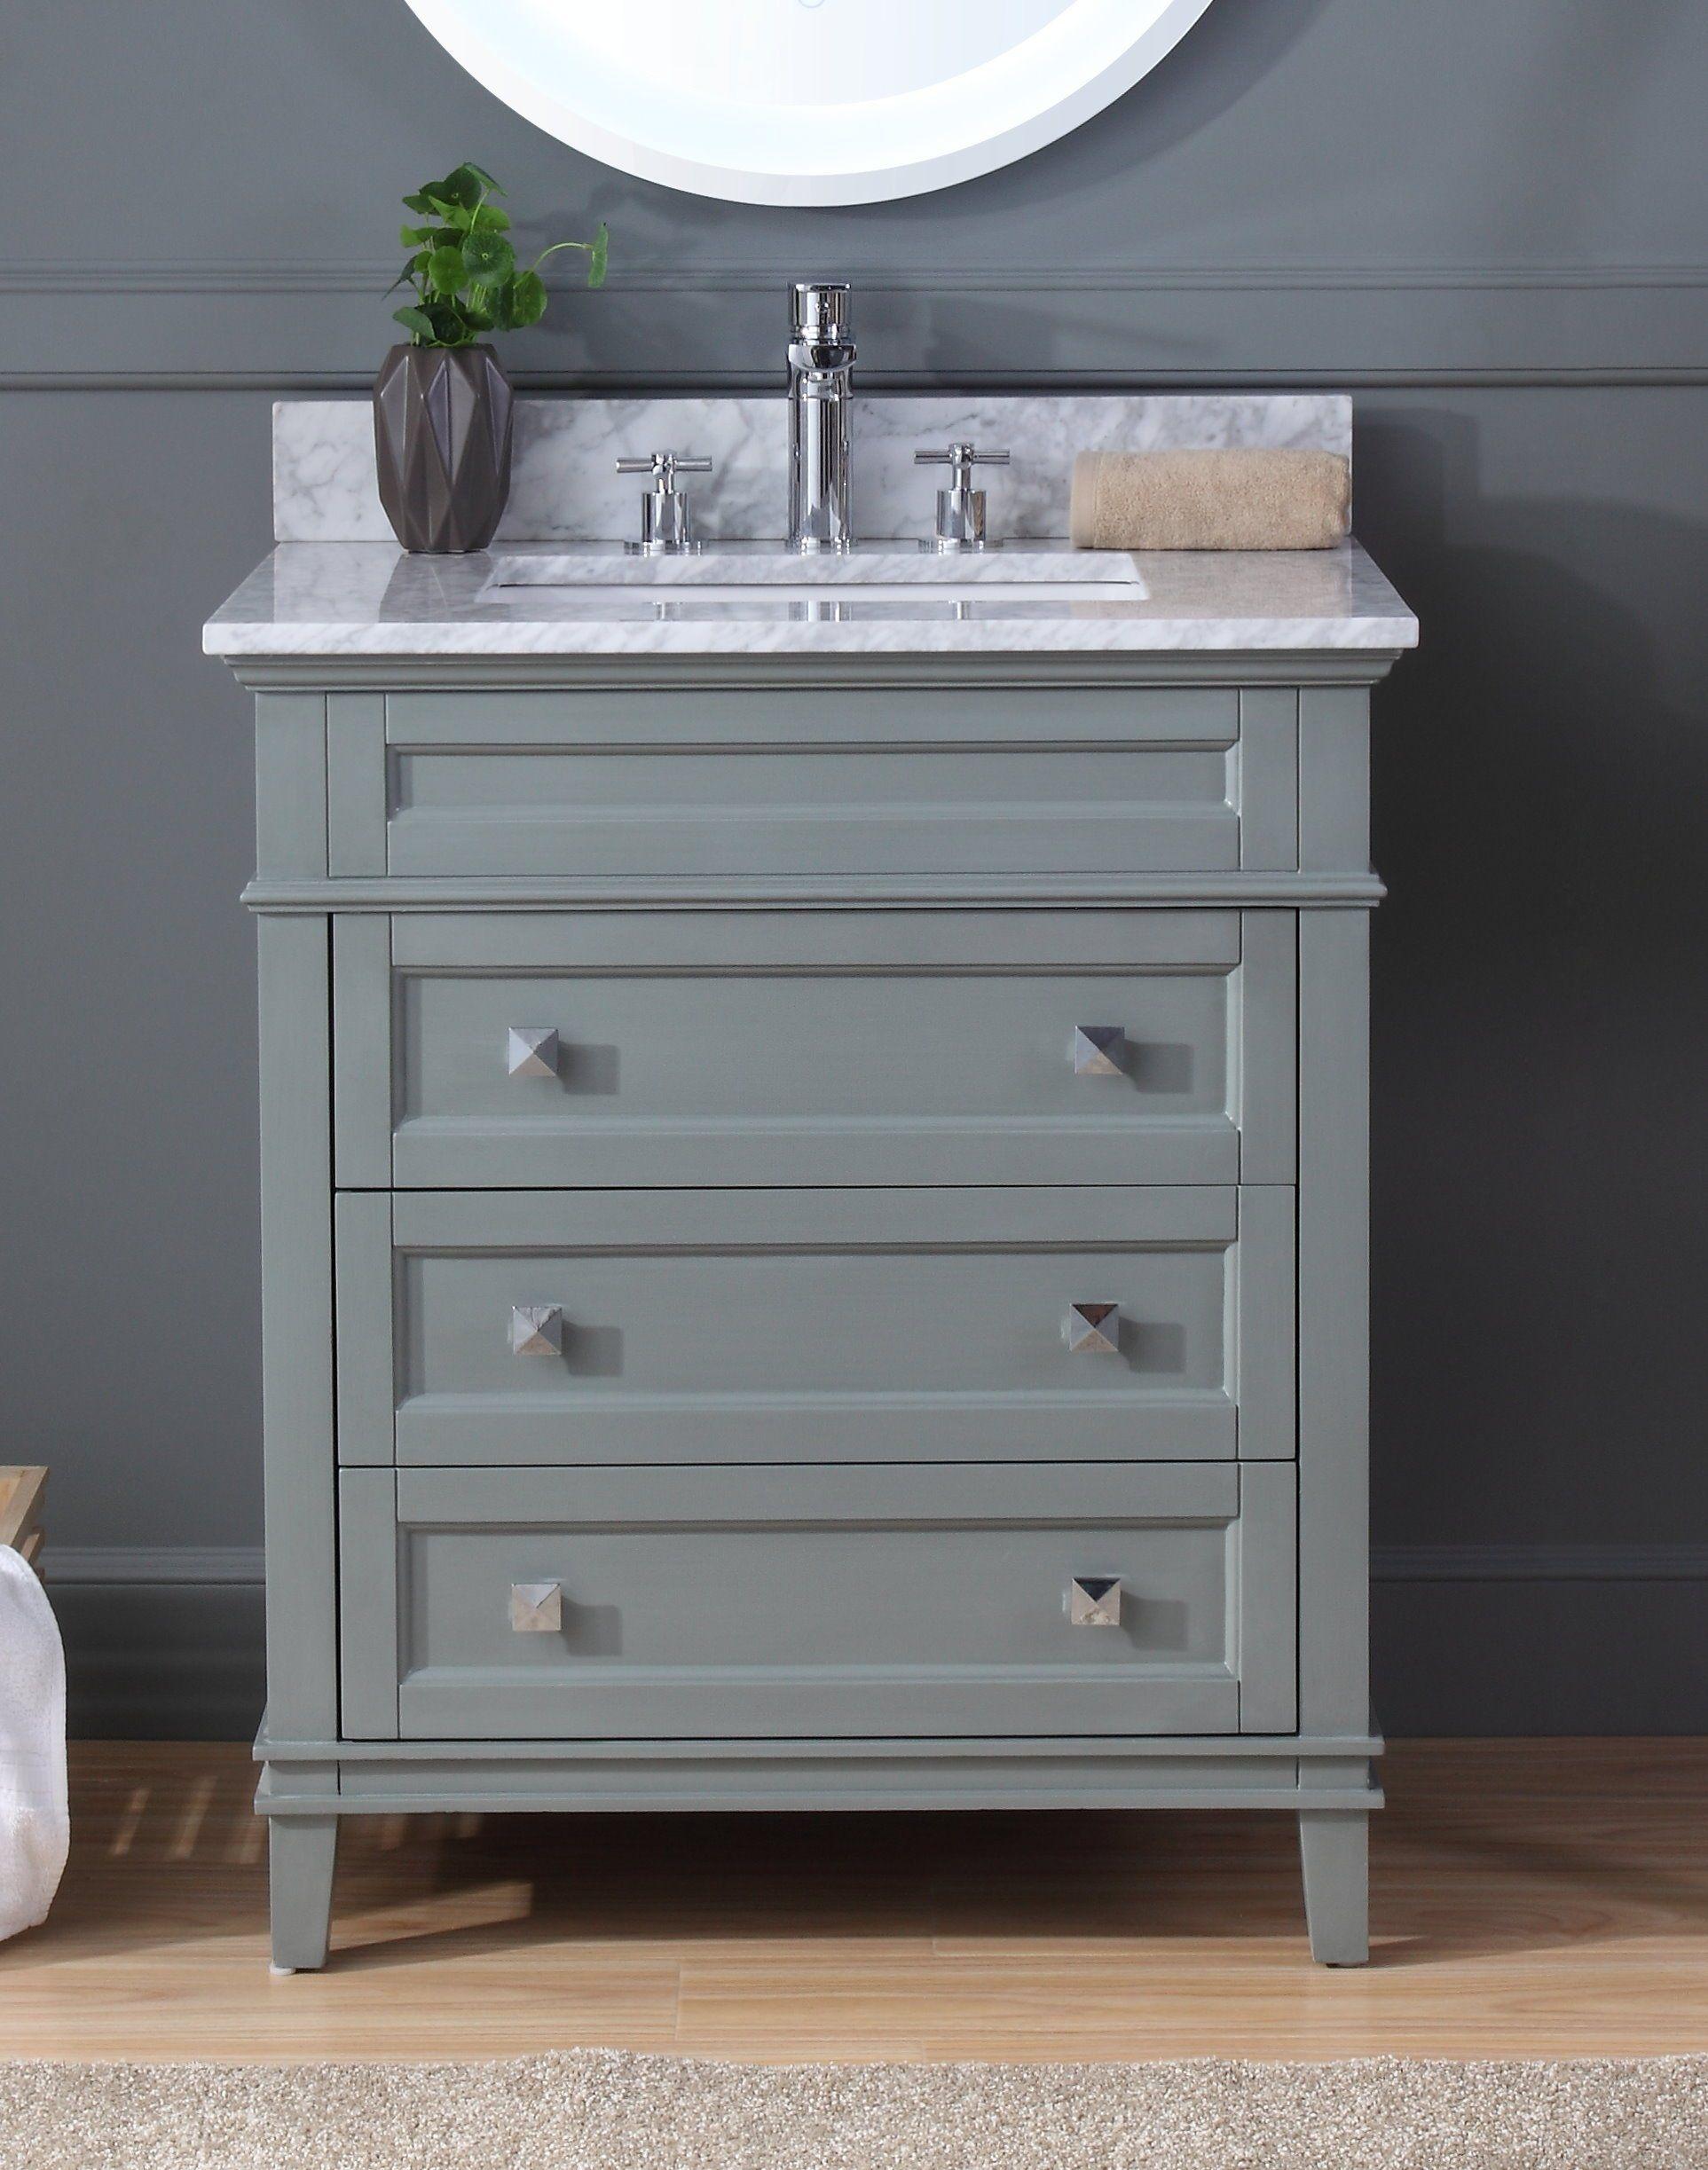 Scott Living Roveland 30 In Dark Gray Undermount Single Sink Bathroom Vanity With Natural Carrara Marble Top Lowes Com In 2021 Grey Bathroom Vanity Single Sink Bathroom Vanity Bathroom Sink Vanity